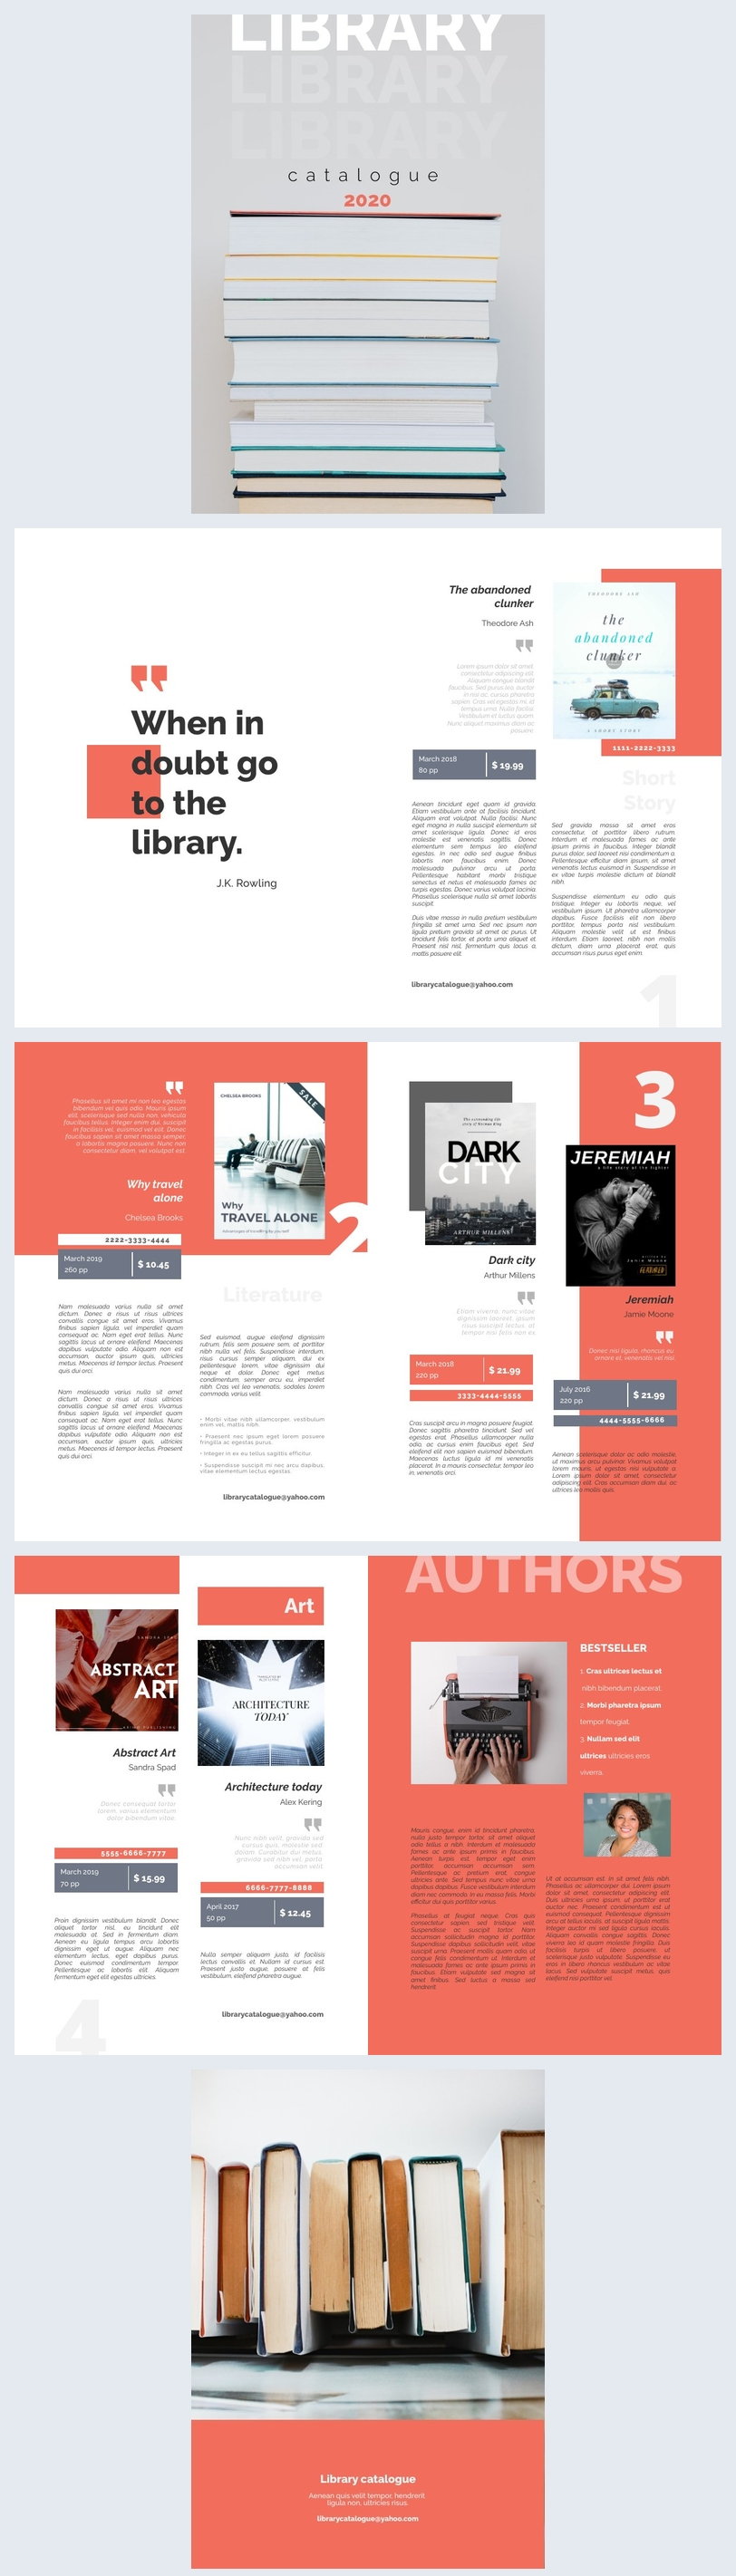 Ejemplo de diseño moderno para catálogo de biblioteca